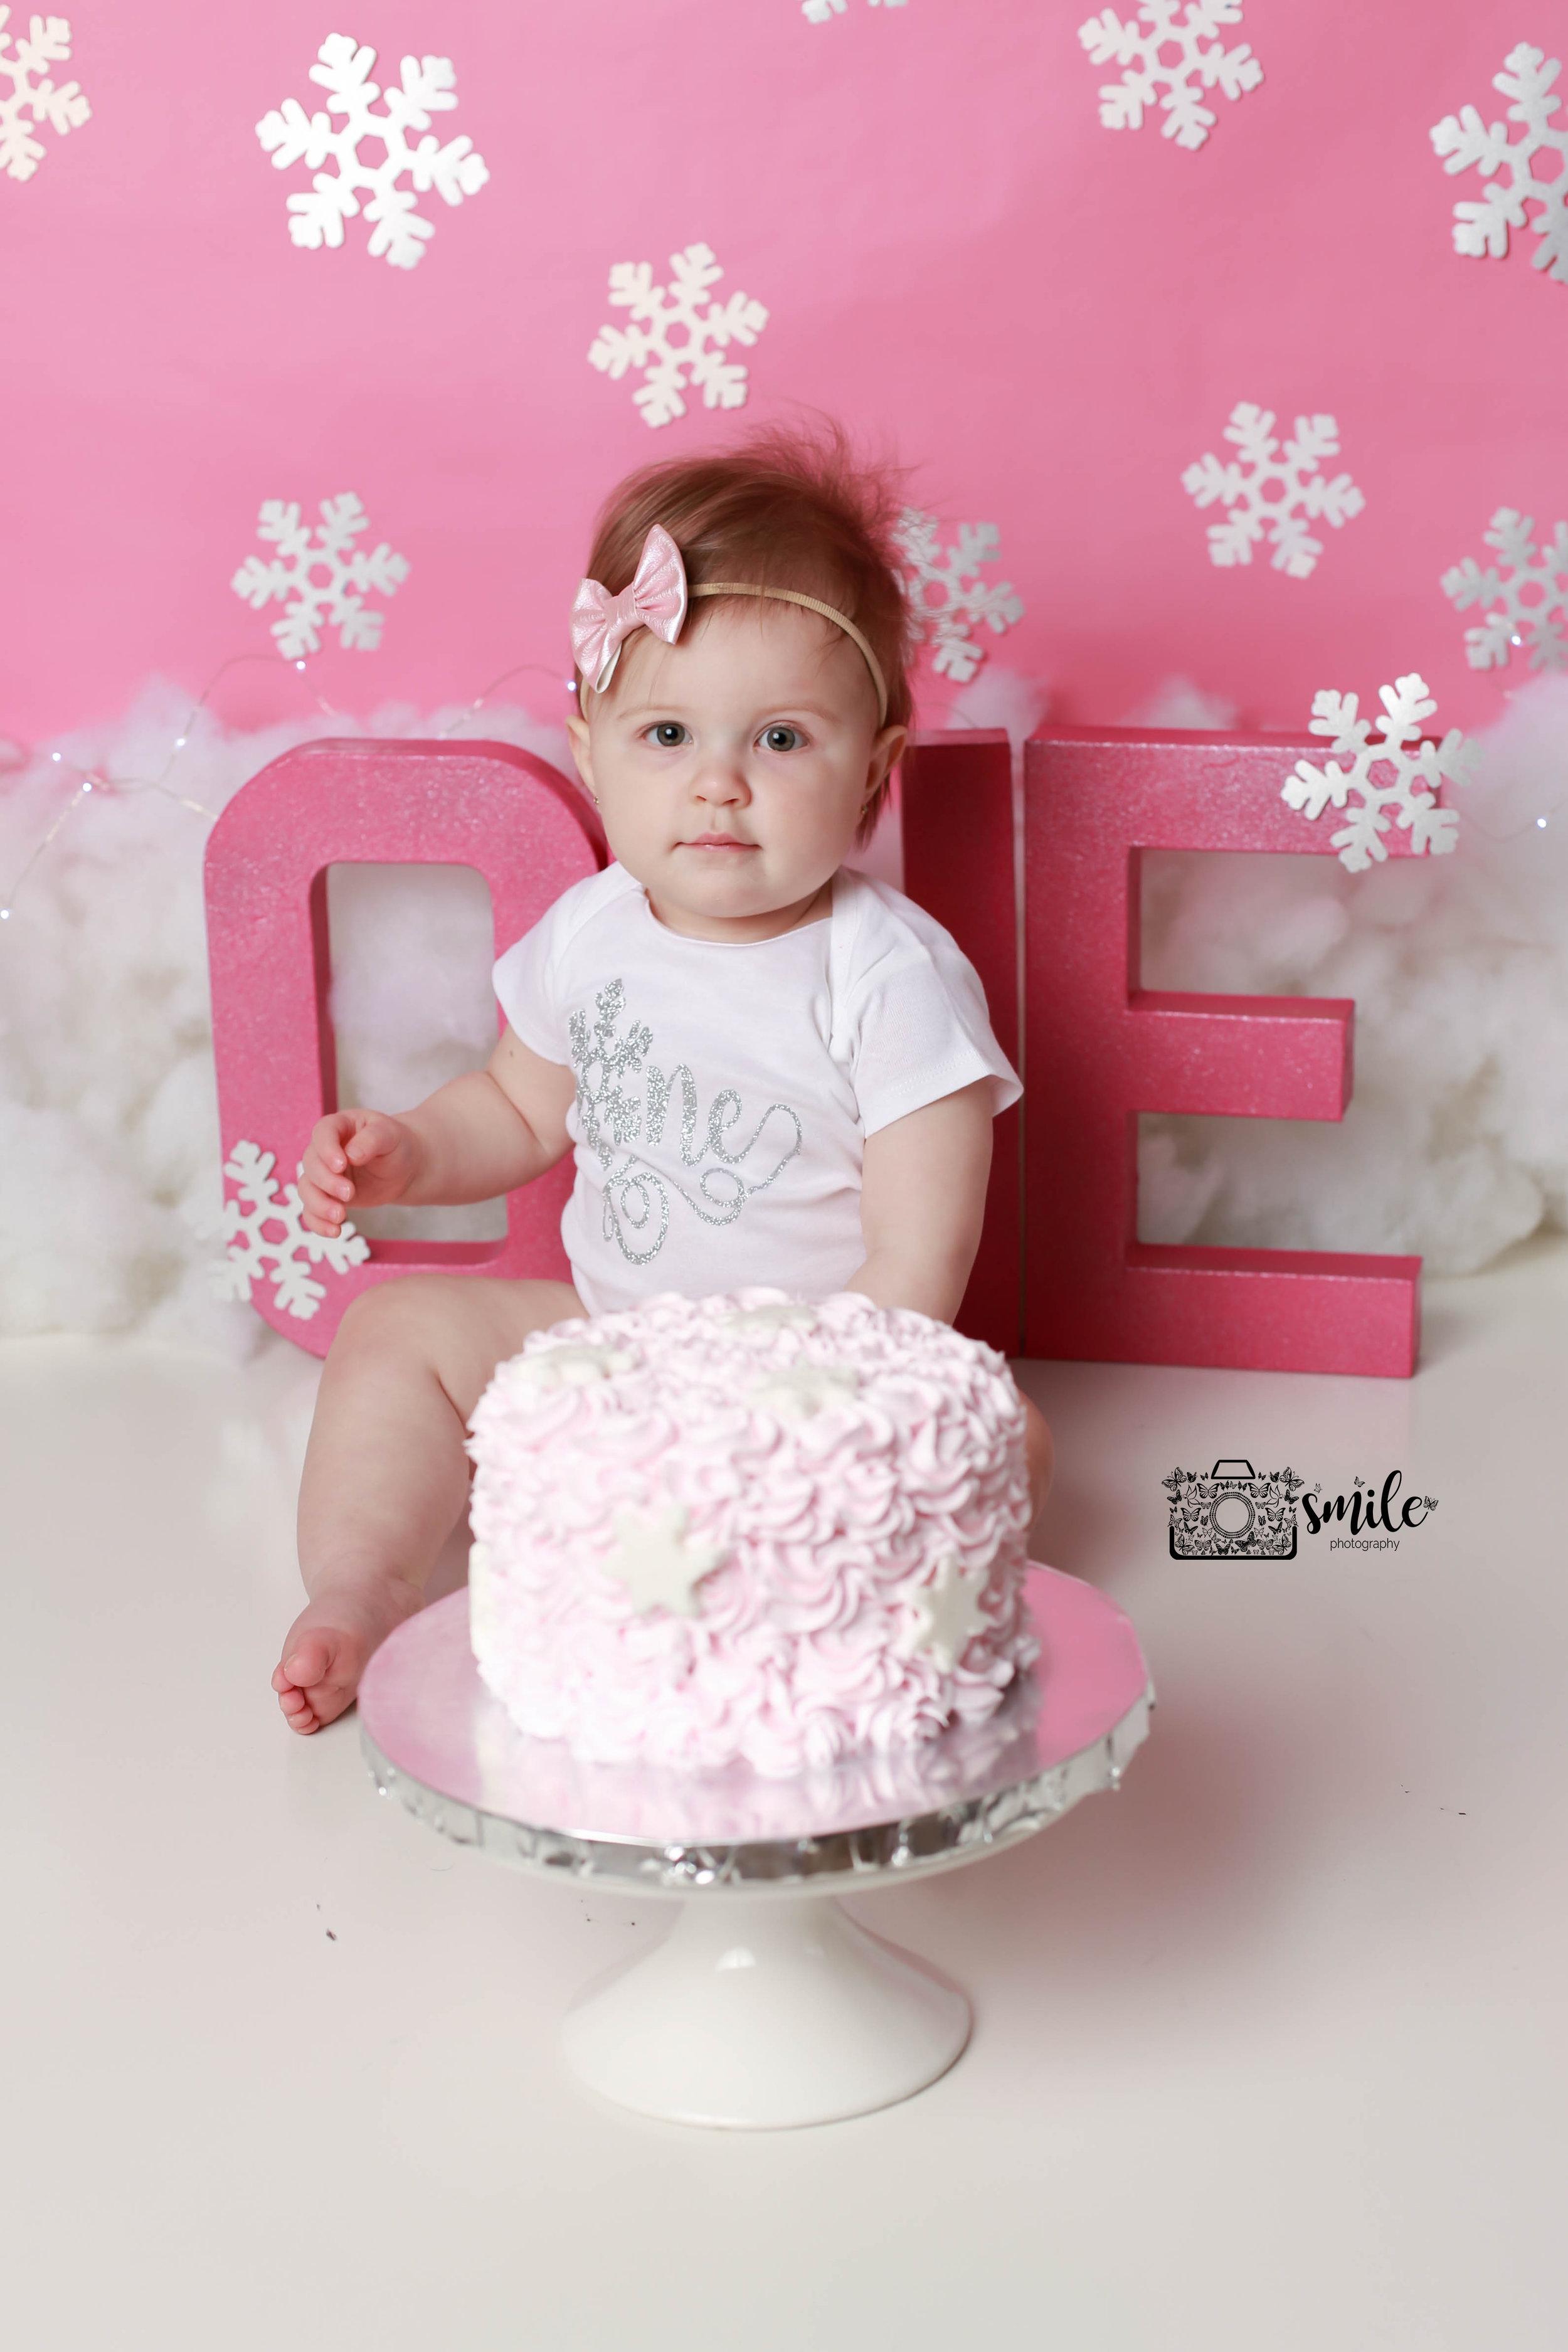 Cake Smash Jersey Shore Child Photographer